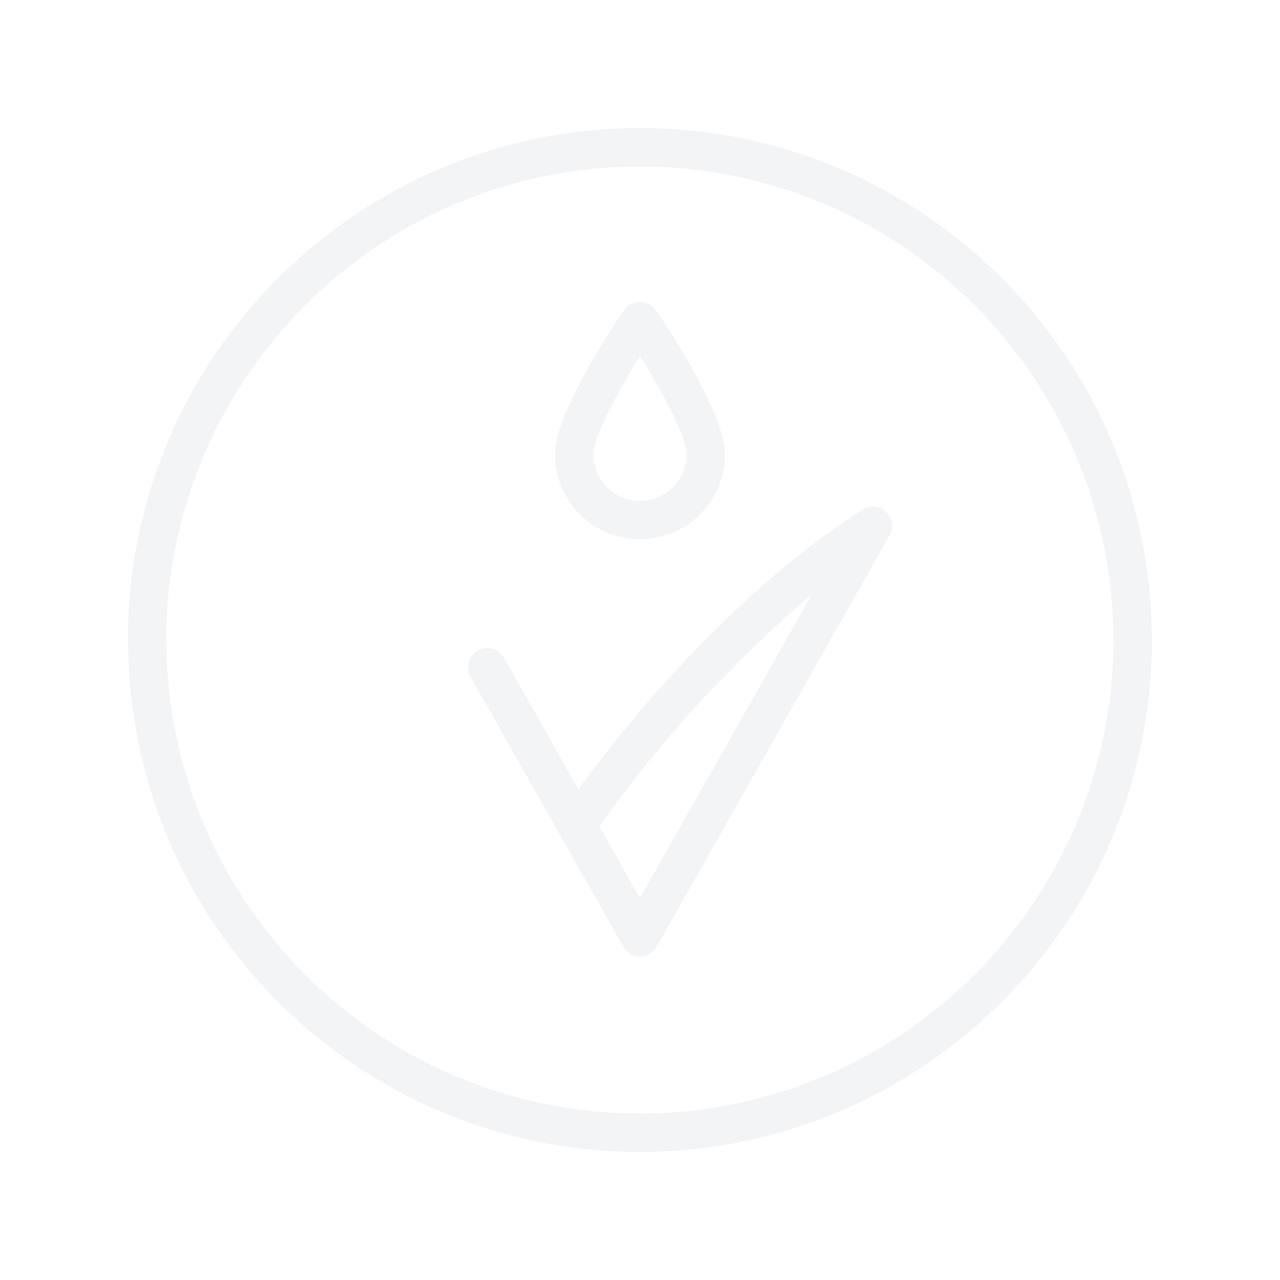 BOURJOIS Sourcil Precision Eyebrow Pencil No.04 Blonde 1.13g